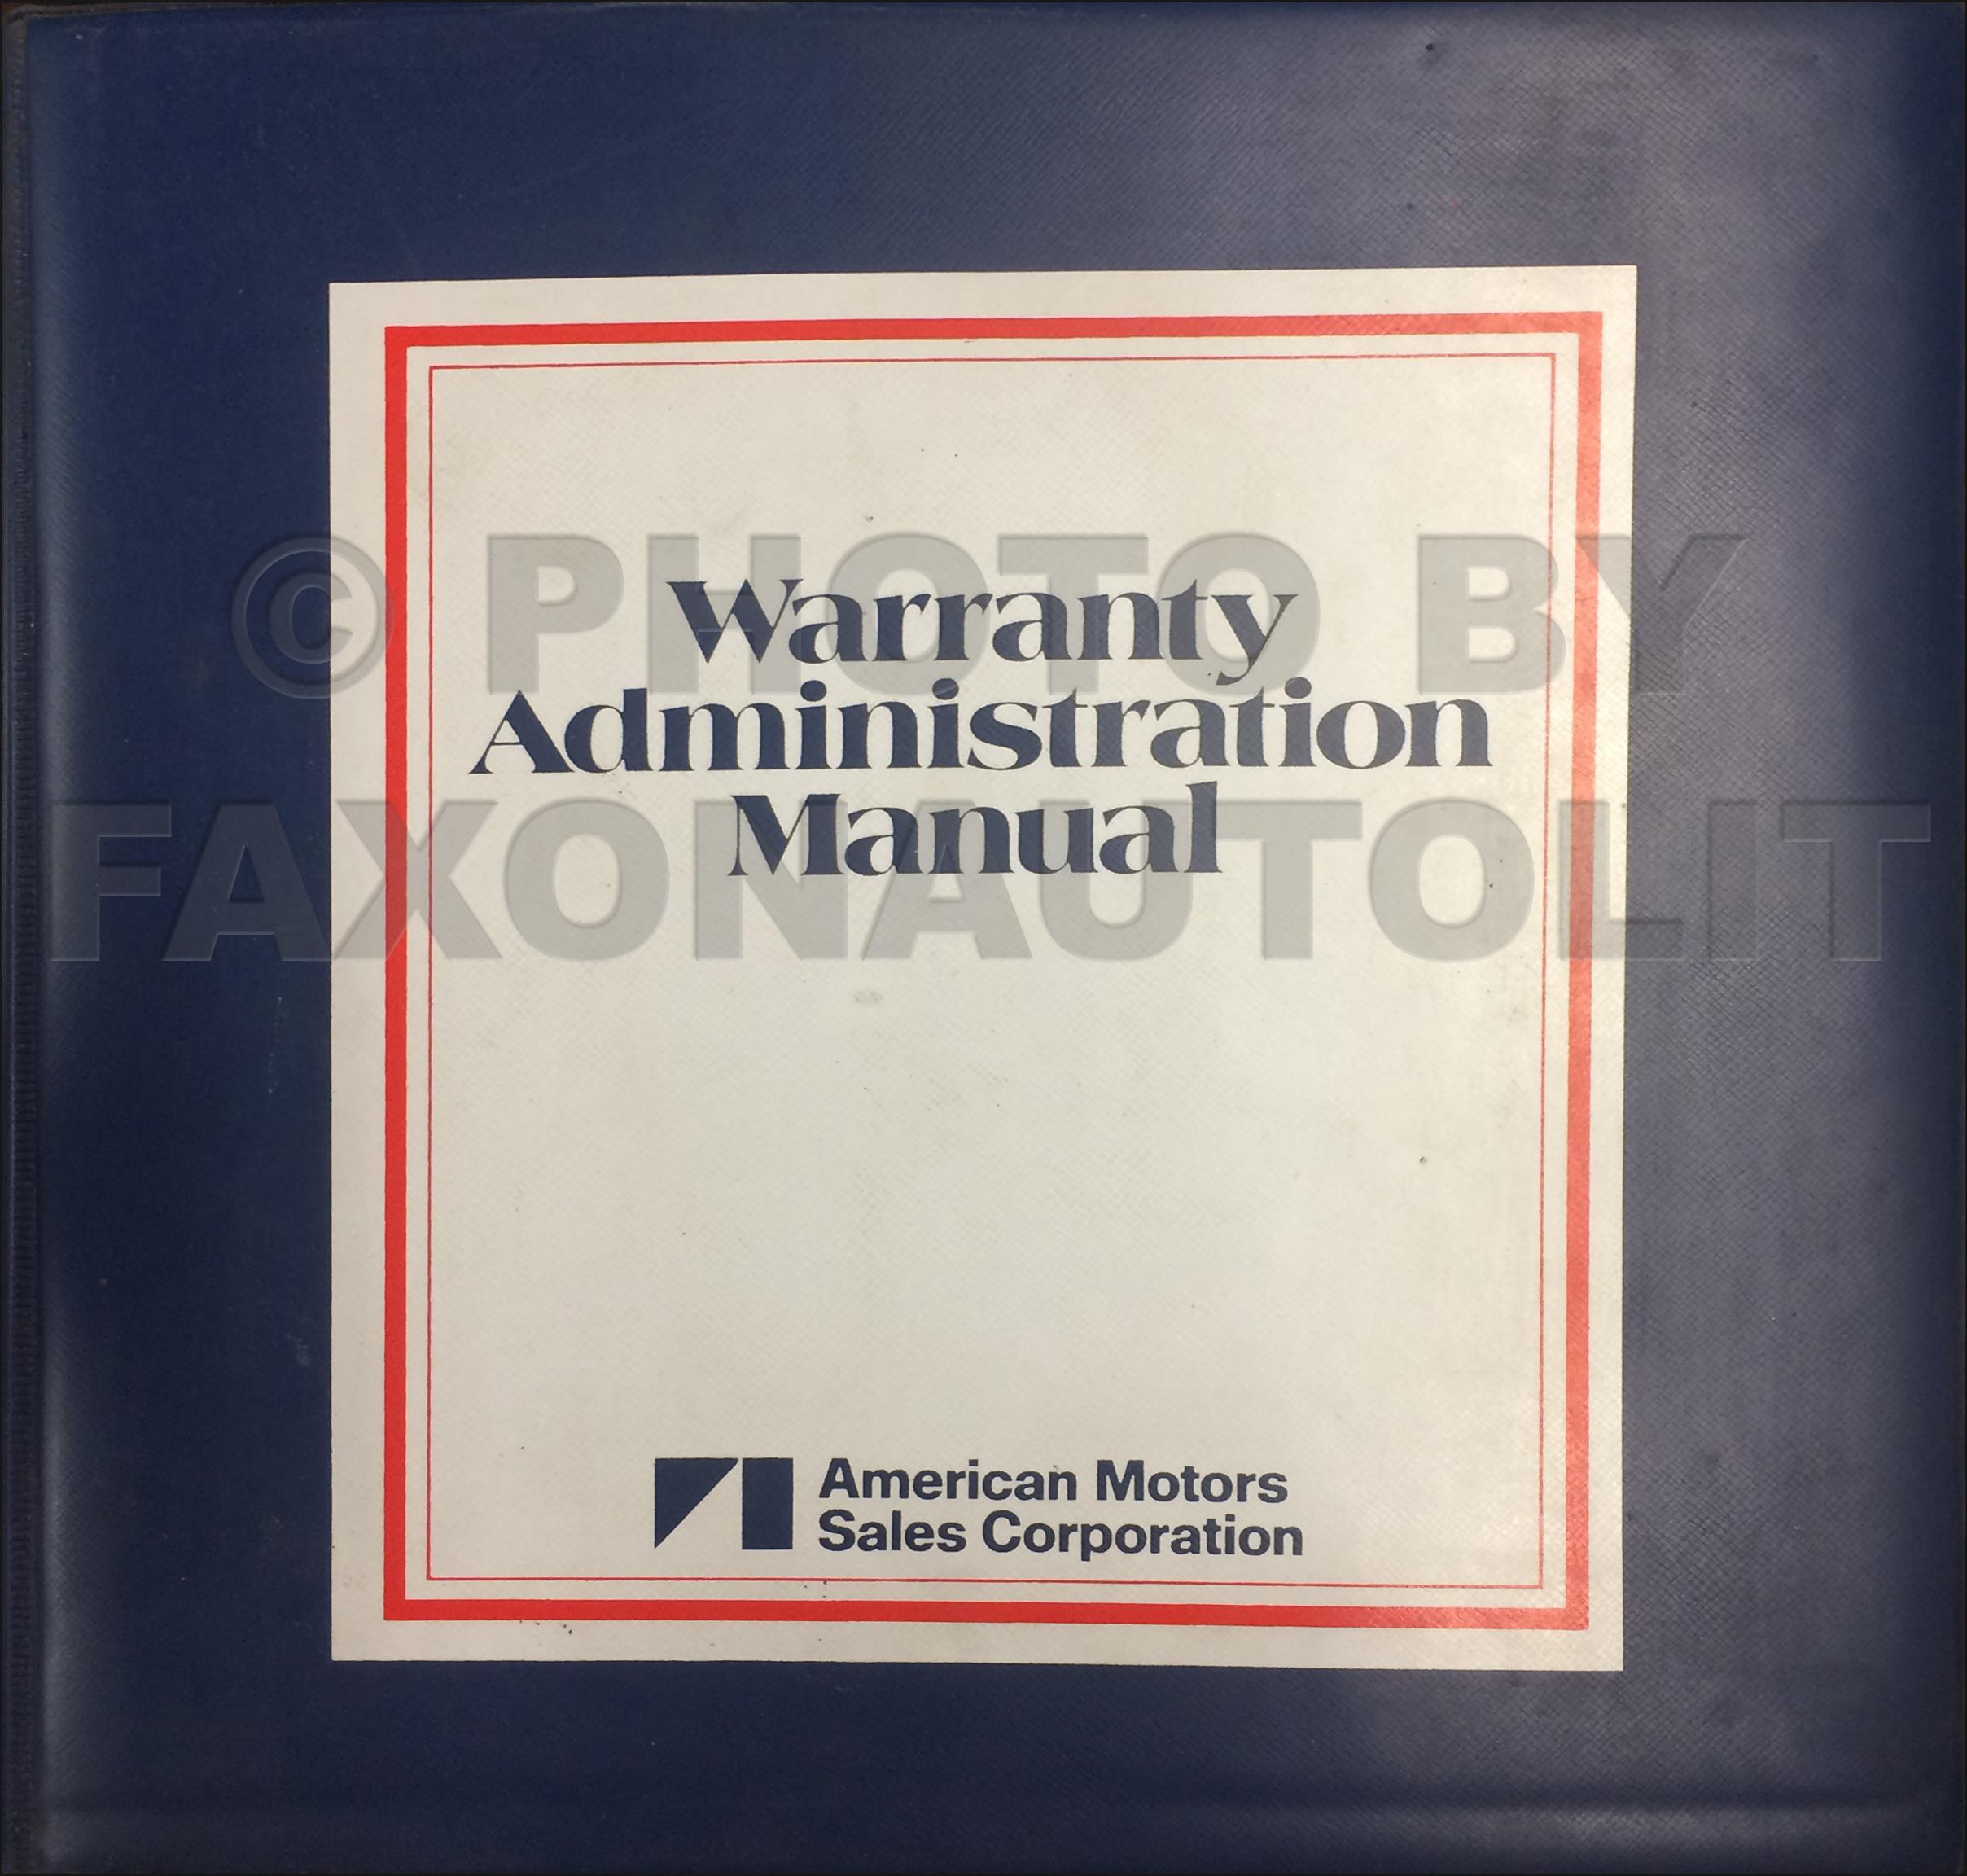 1973 1980 Amc Warranty Administration Manual Original Eagle Wiring Diagram 2005 Nissan Maxima Cd Rom Repair